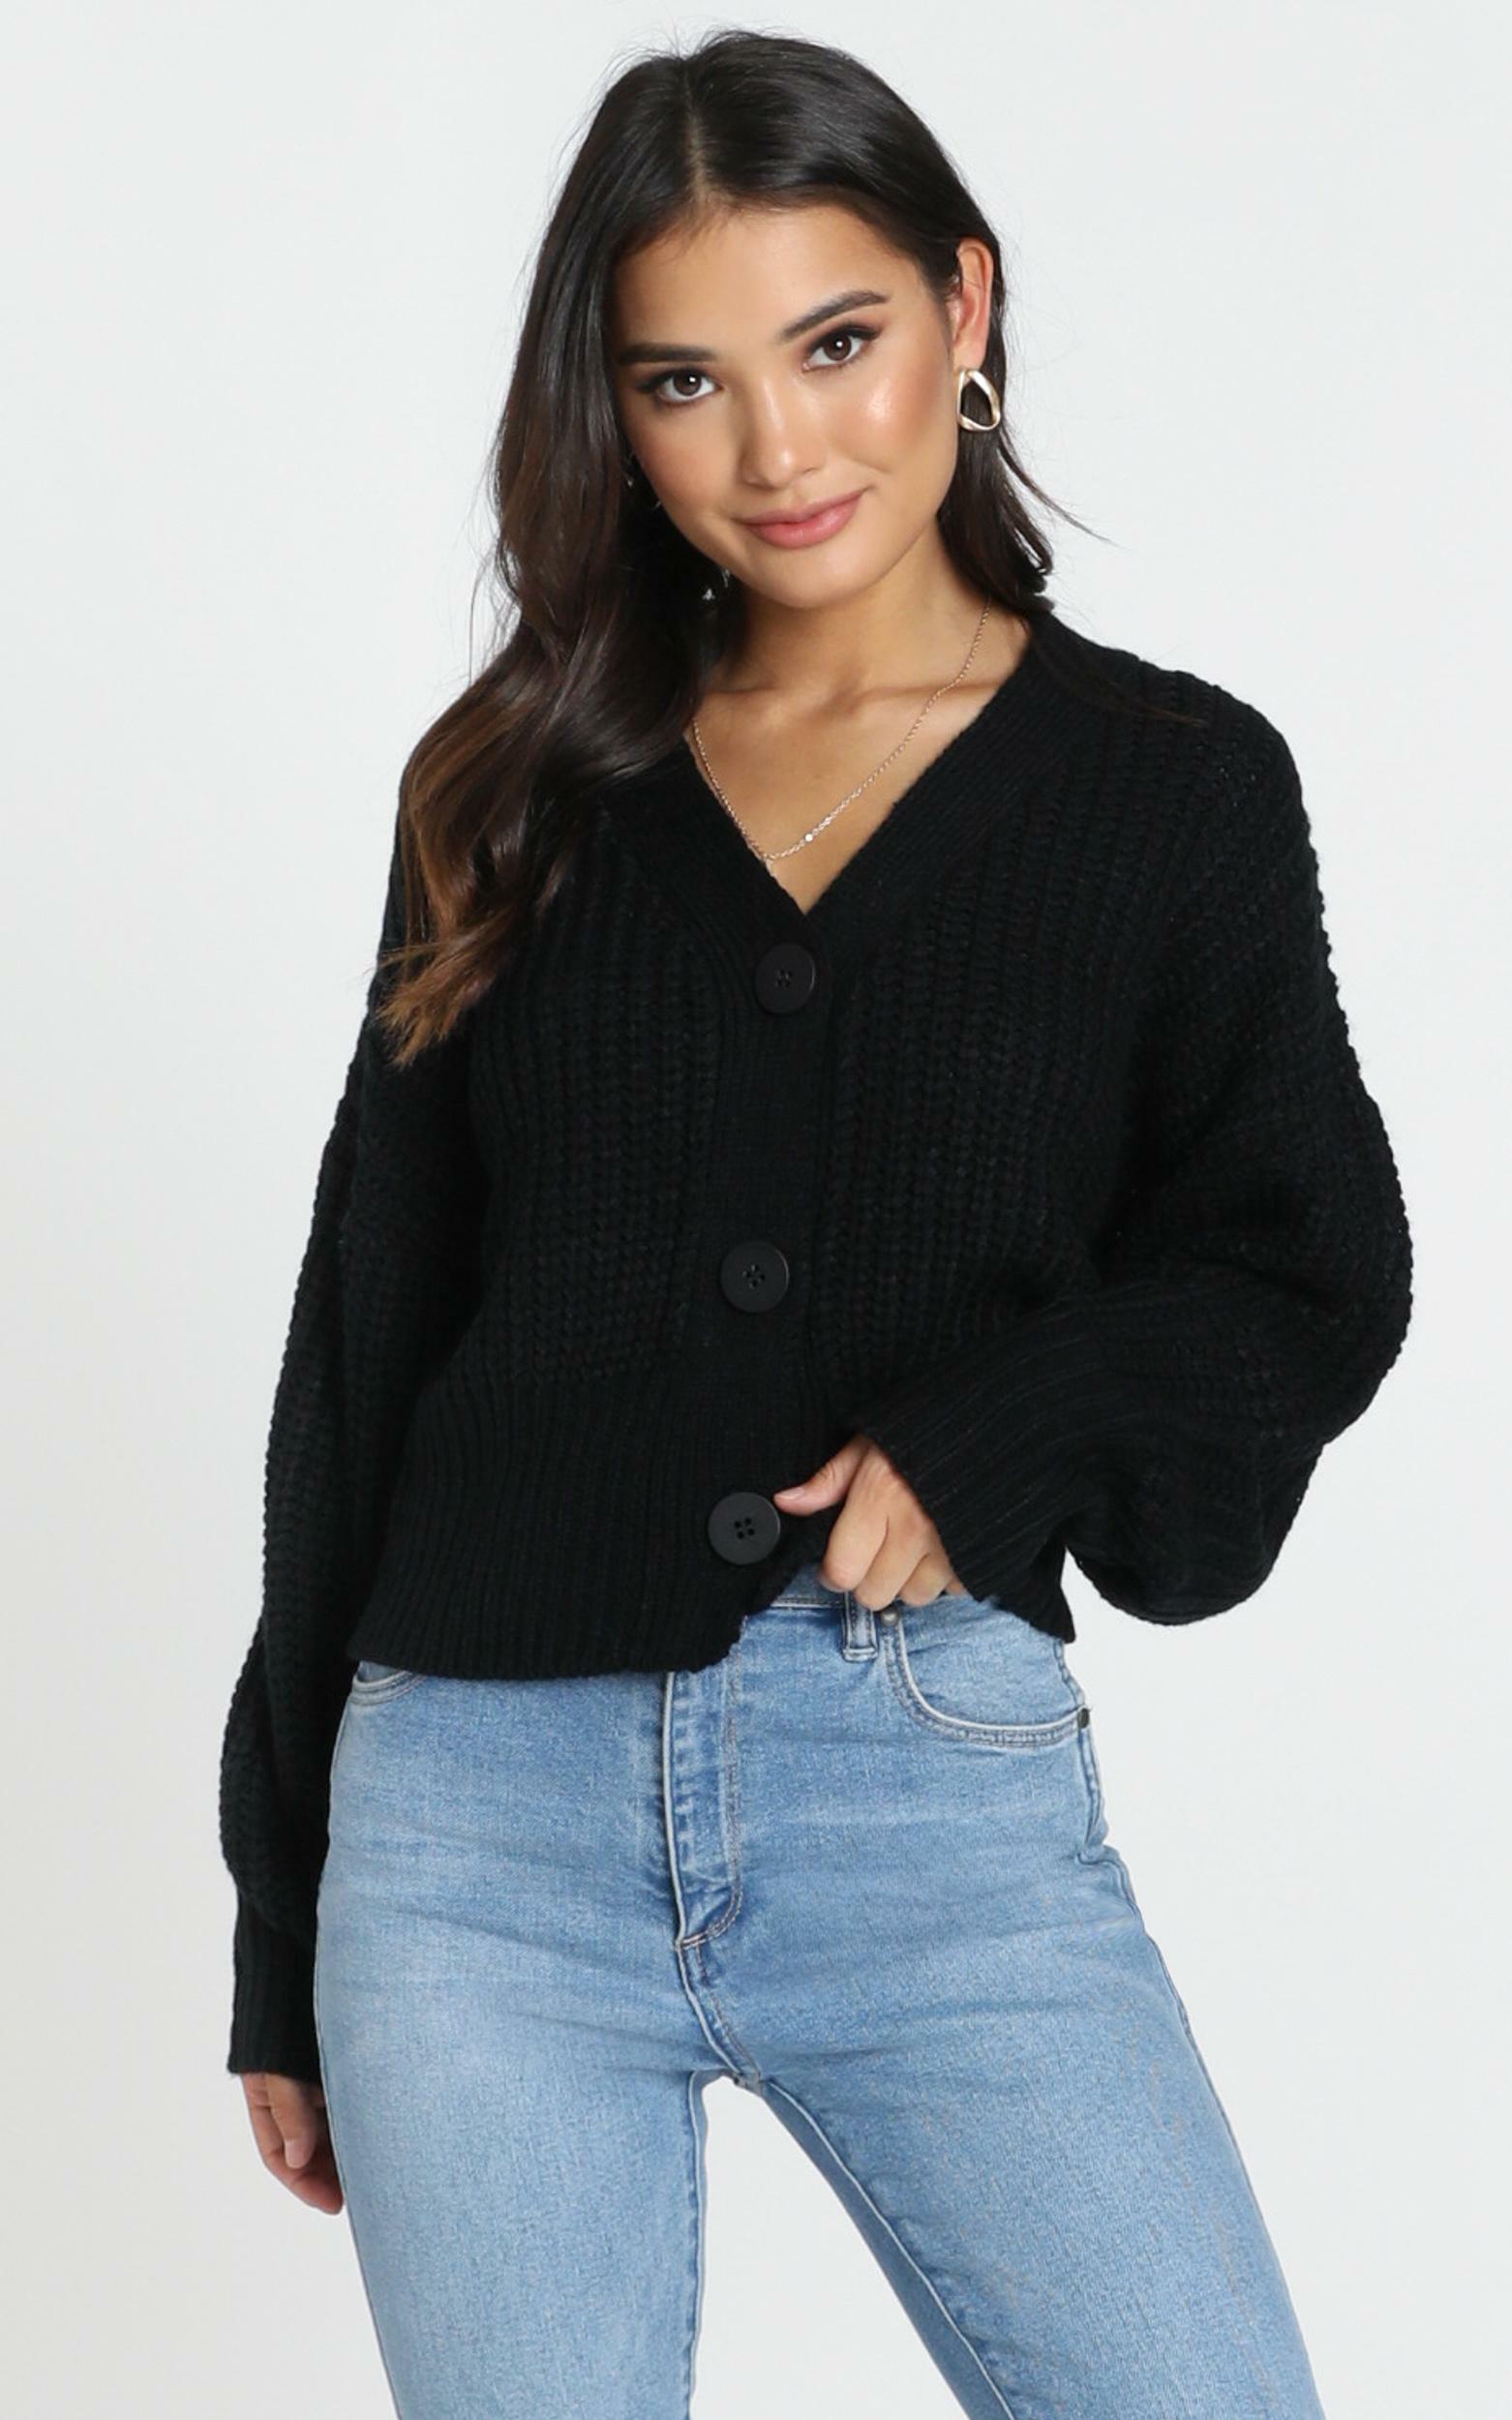 Dakota Knit Cardigan in black - 12 (L), Black, hi-res image number null